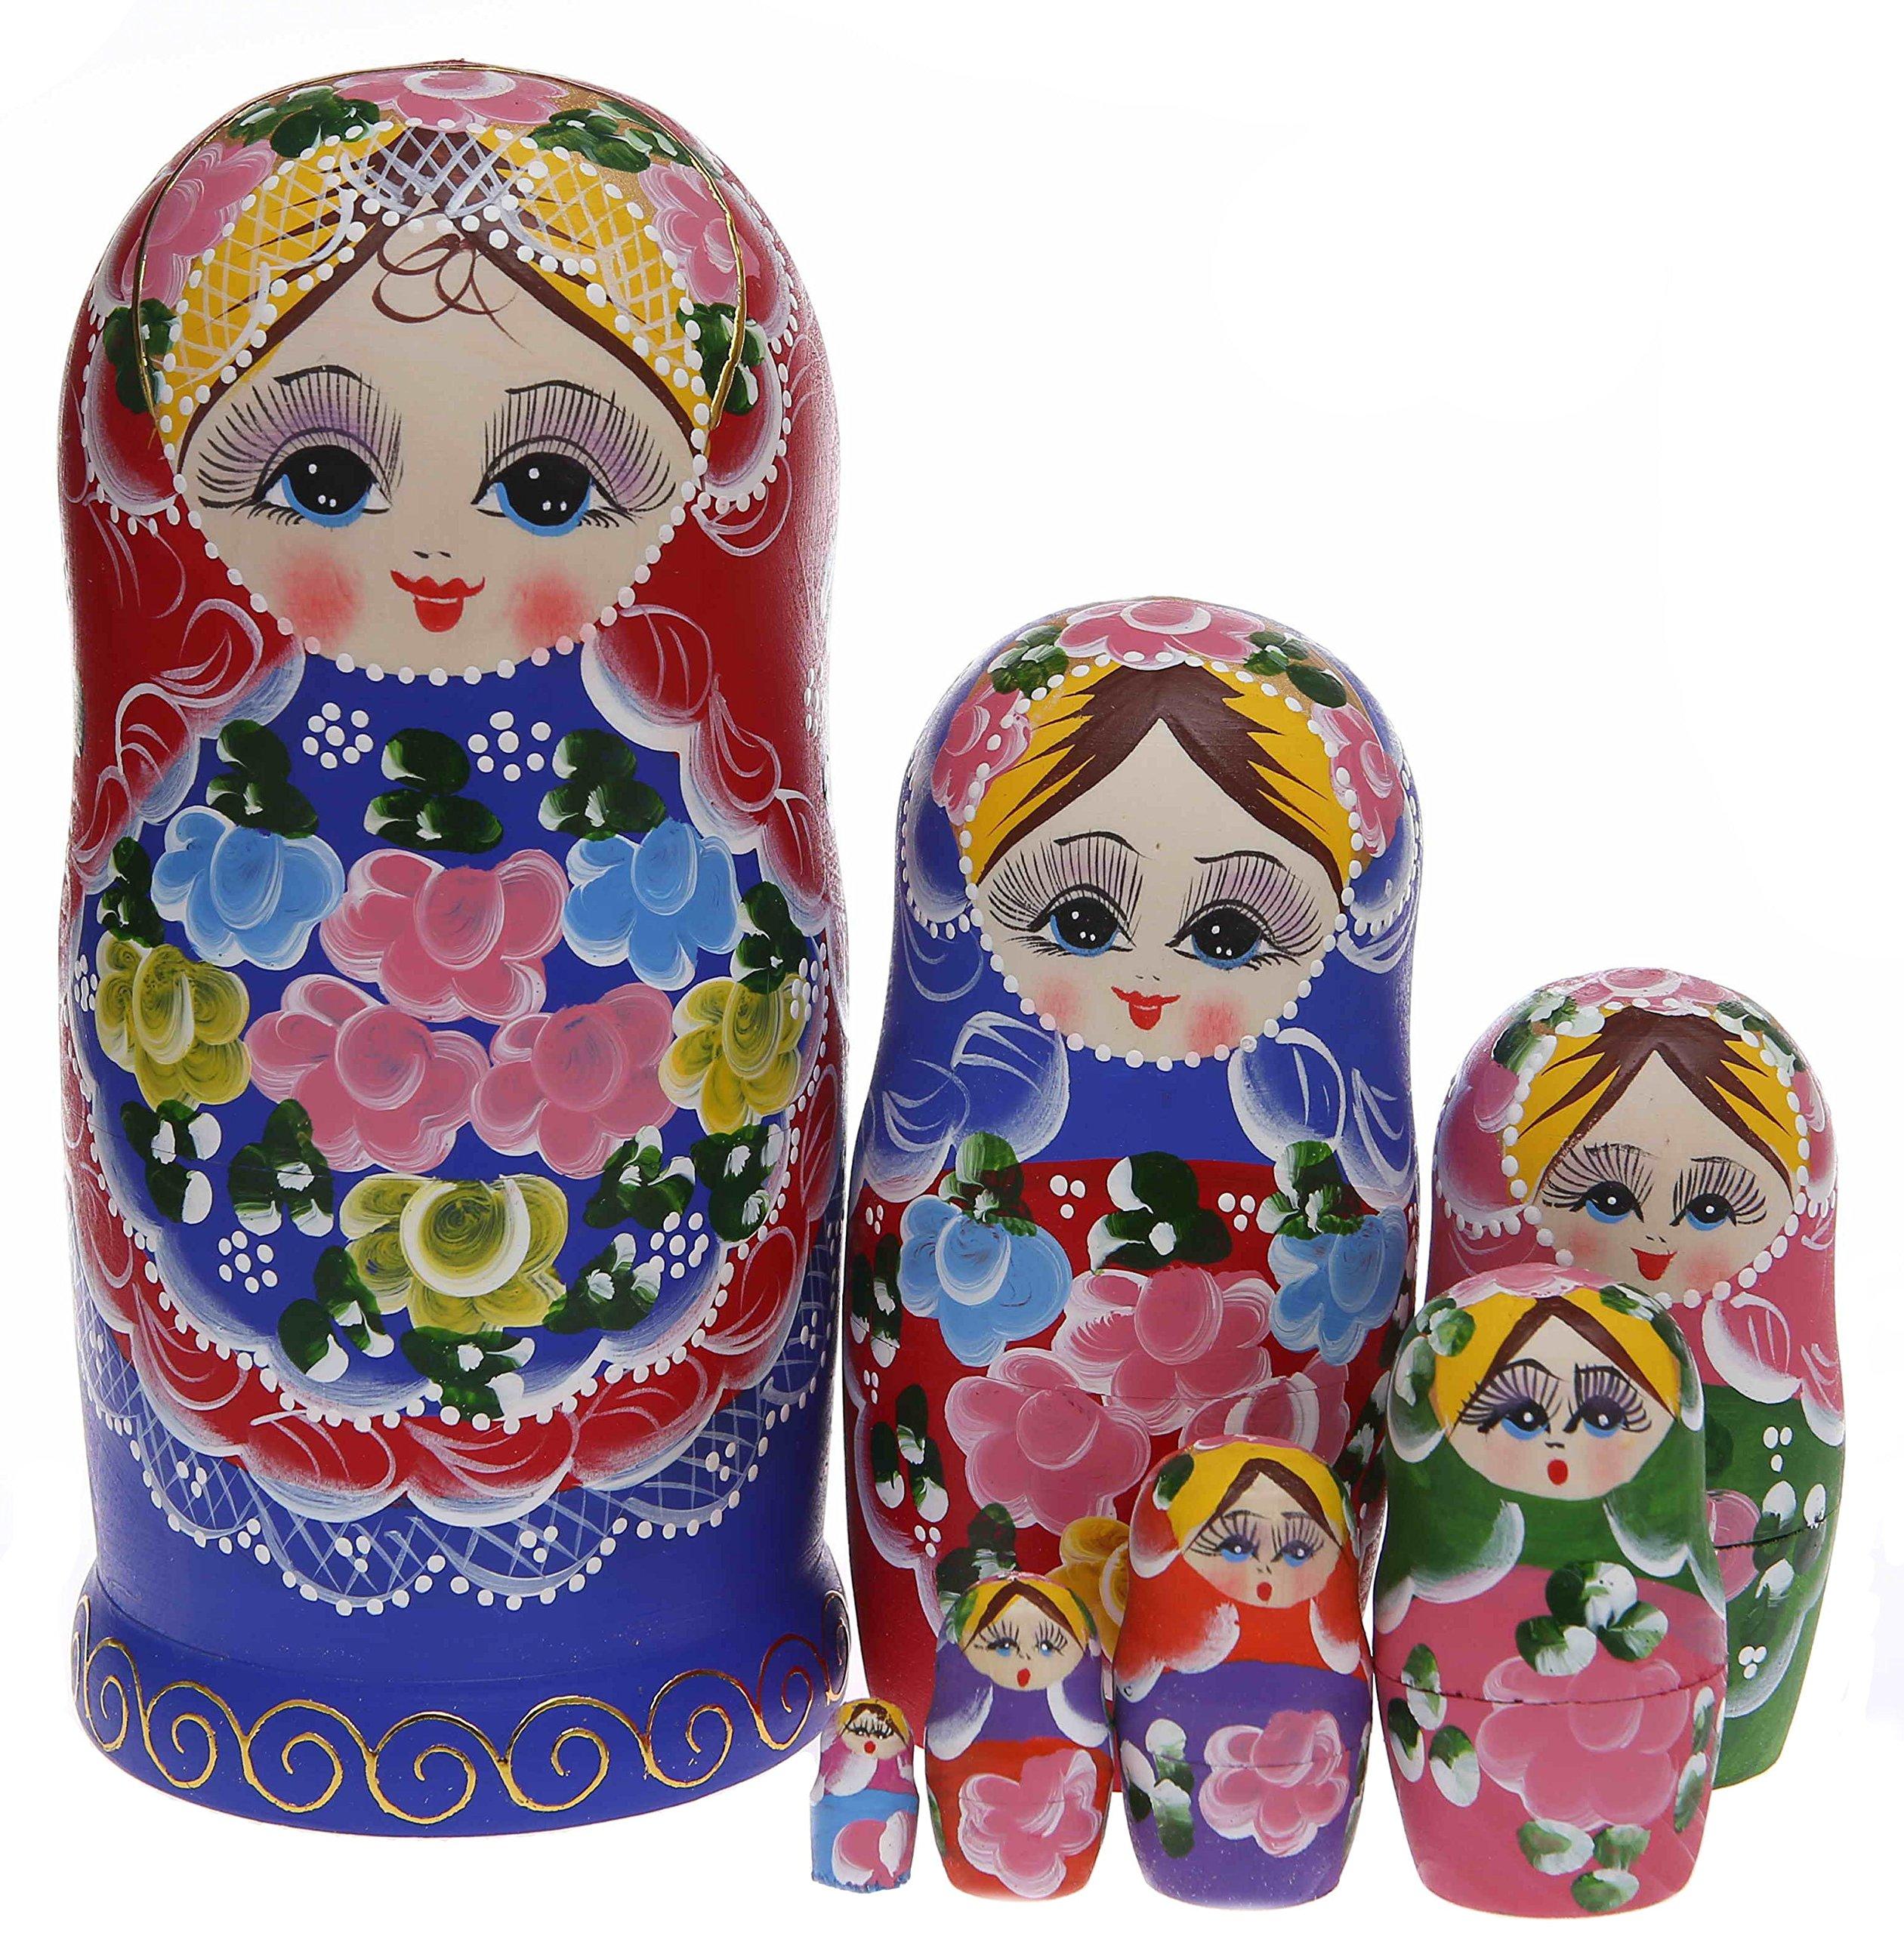 Moonmo 7pcs Beautiful Handmade Wooden Russia Nesting Dolls Gift Russian Nesting Wishing Dolls Beautiful Flower Matryoshka Traditional.